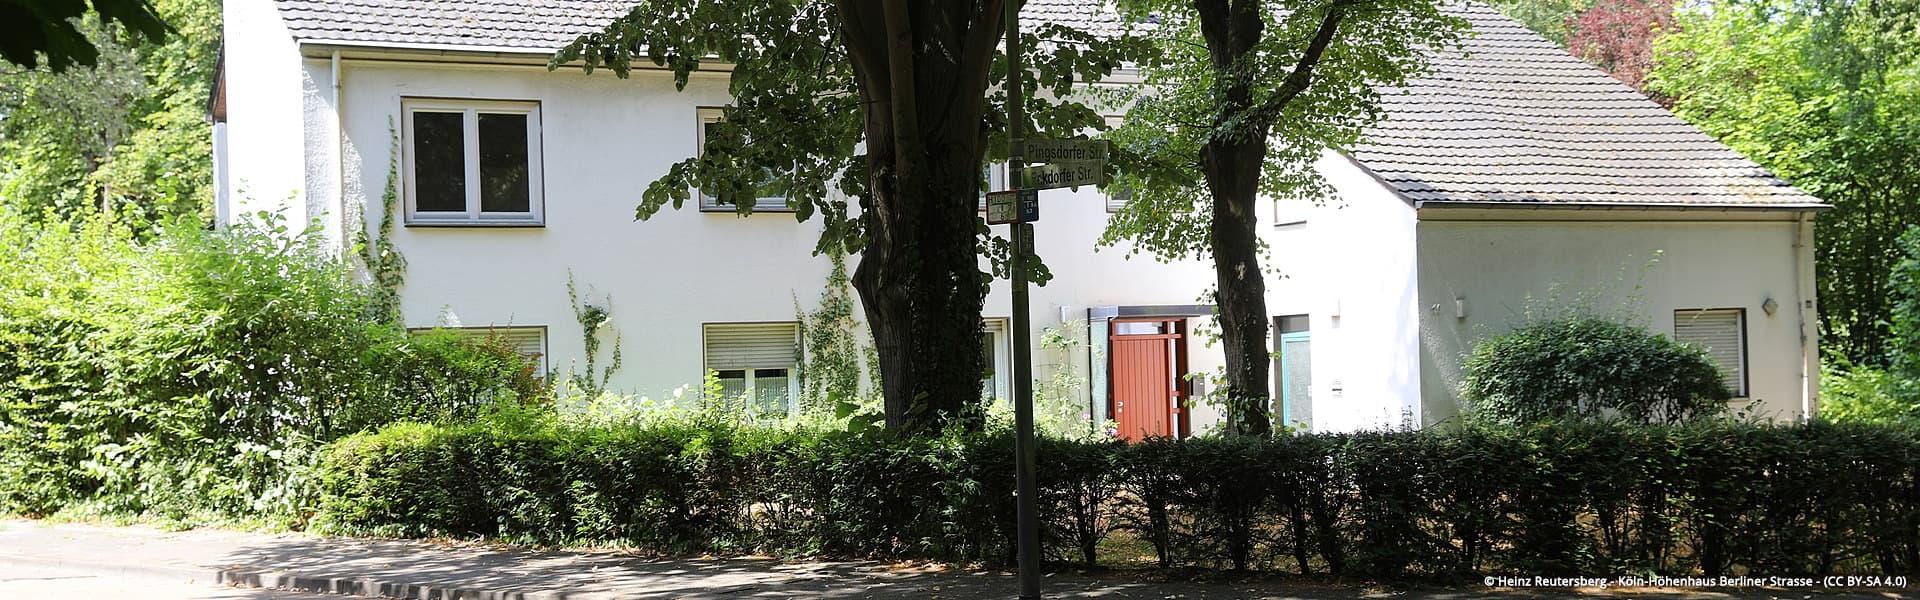 Raderthal | Goost Immobilien